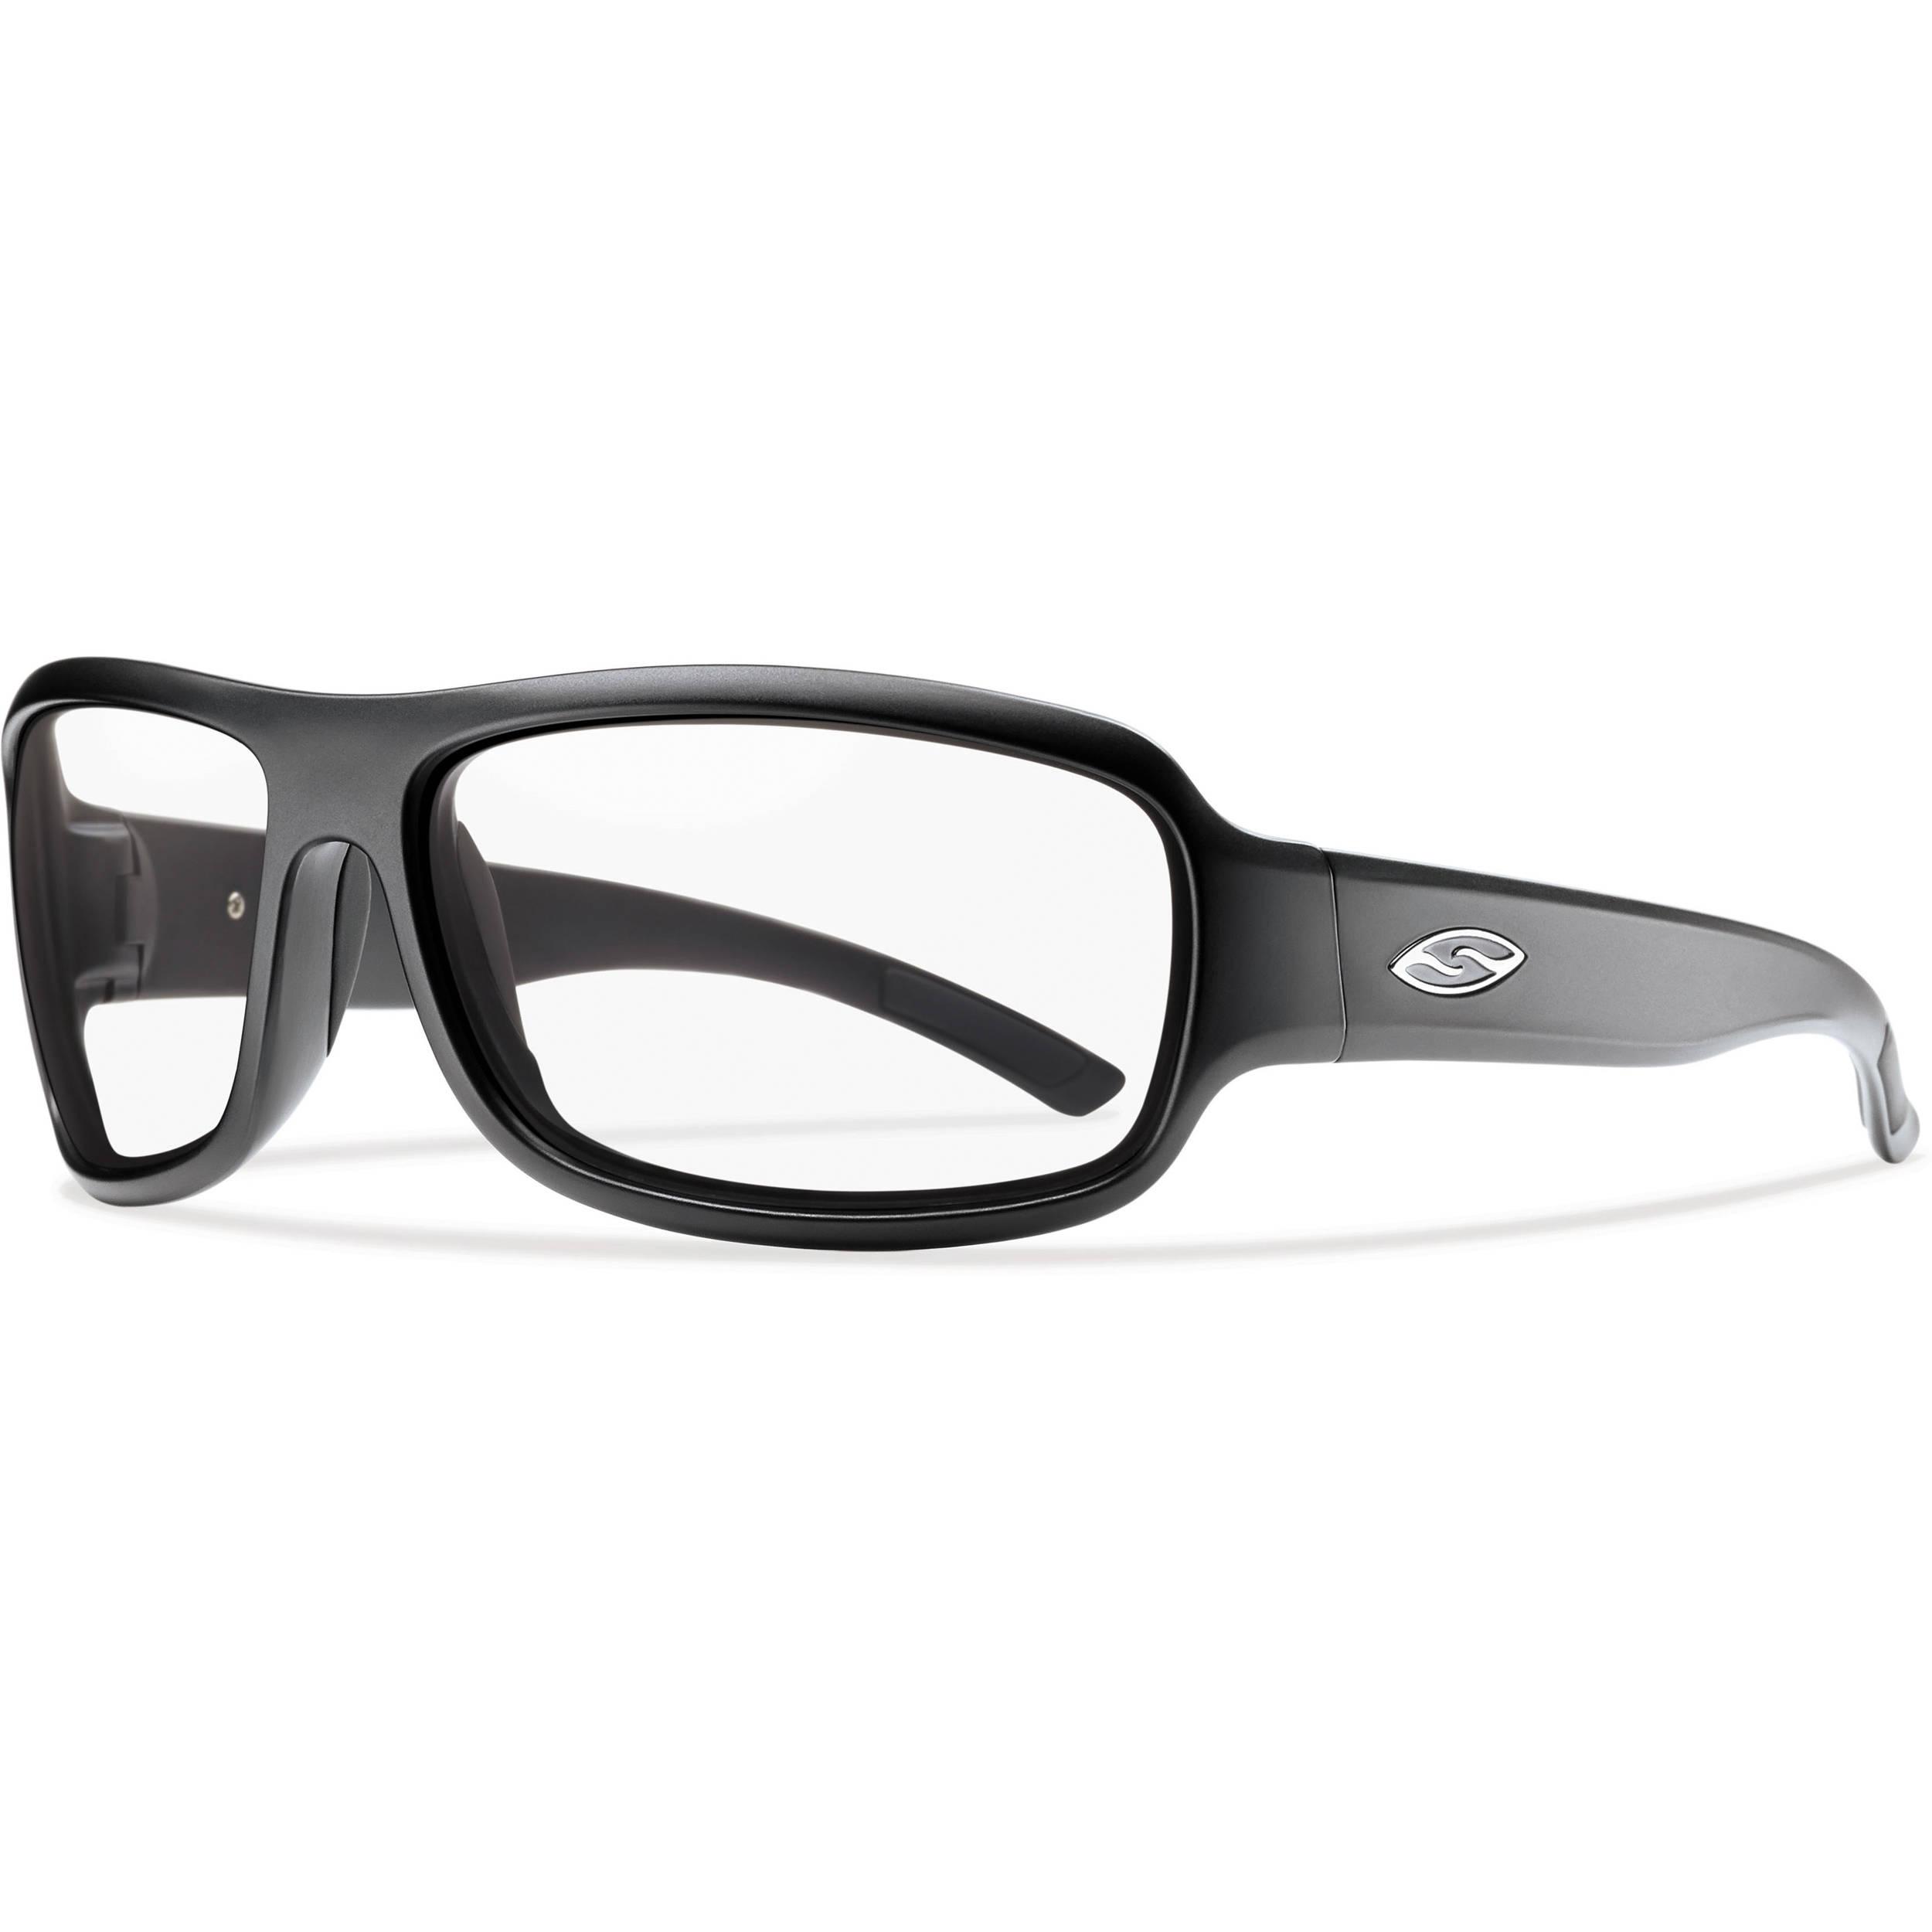 b610c381da5 Smith Optics Drop Elite Tactical Sunglasses (Matte Black - Clear Lens)